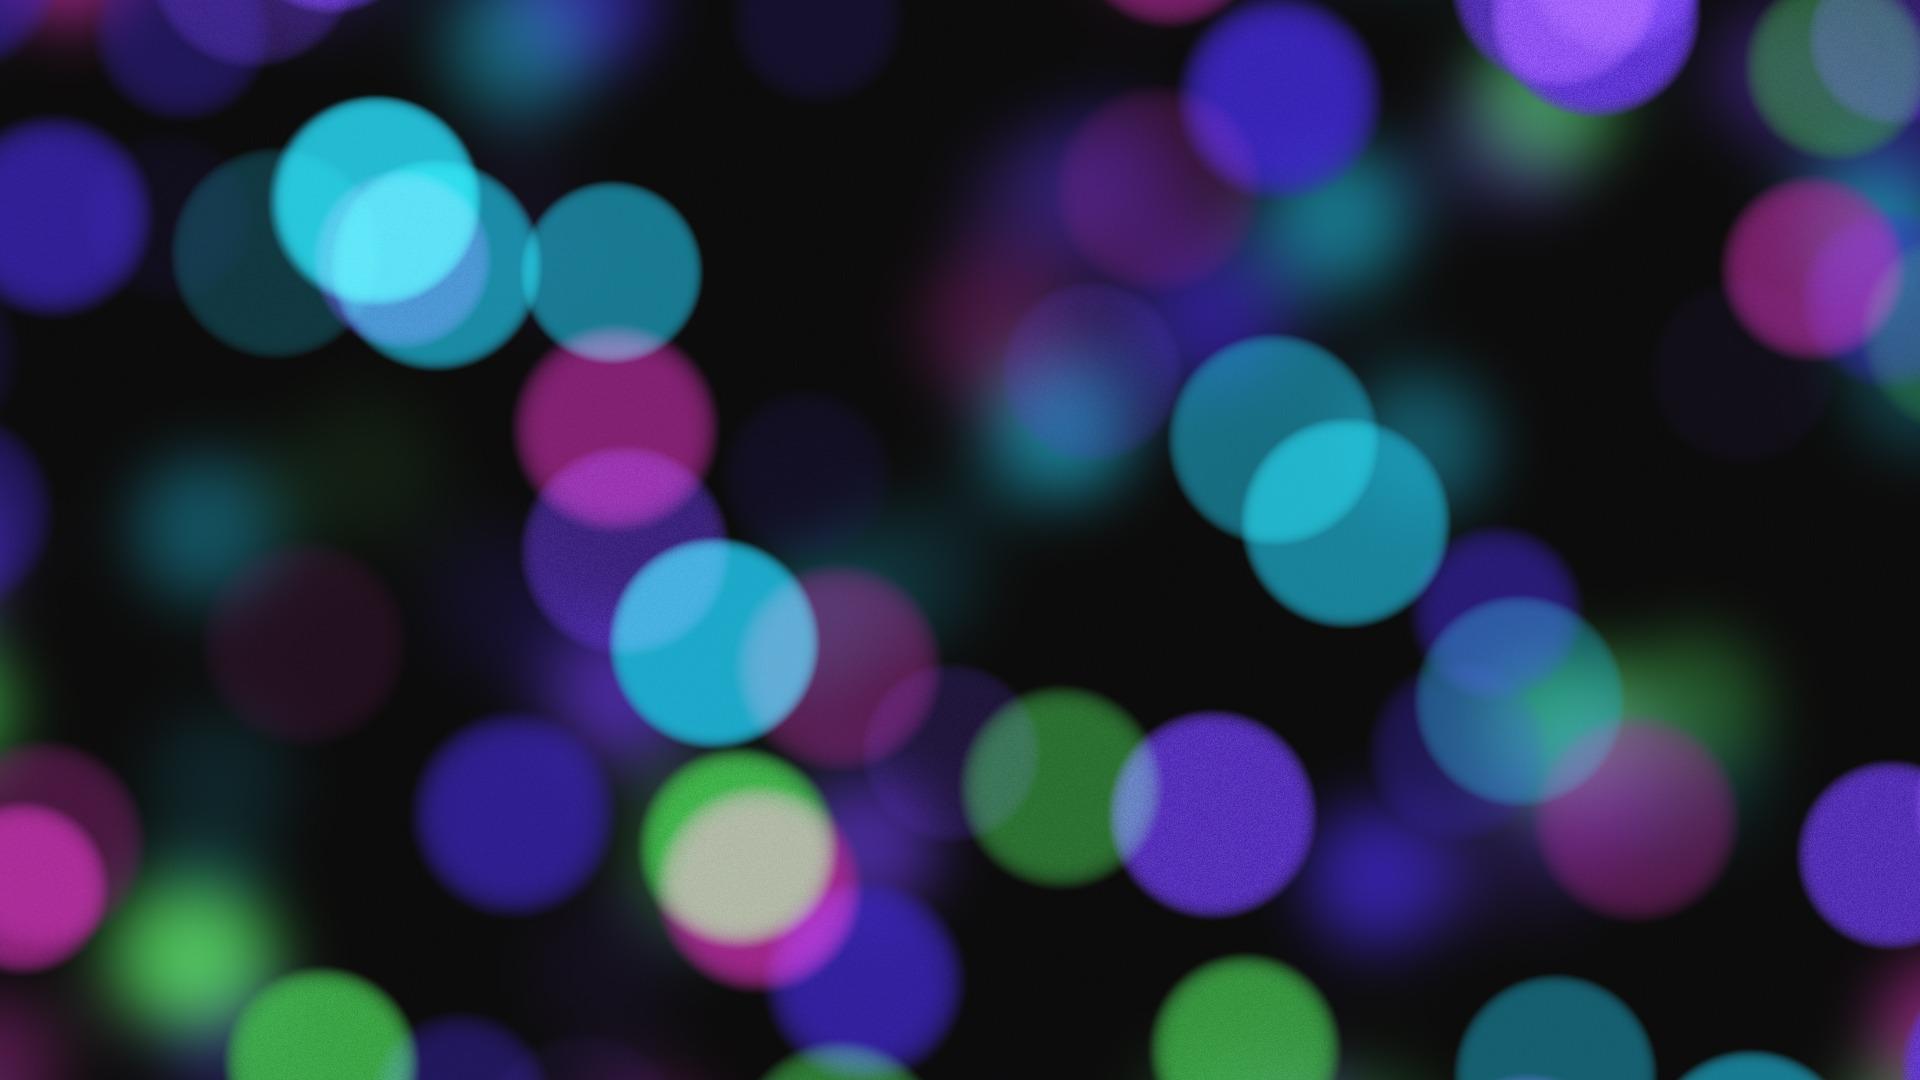 Download 107+ Background Blue Green Light Terbaik